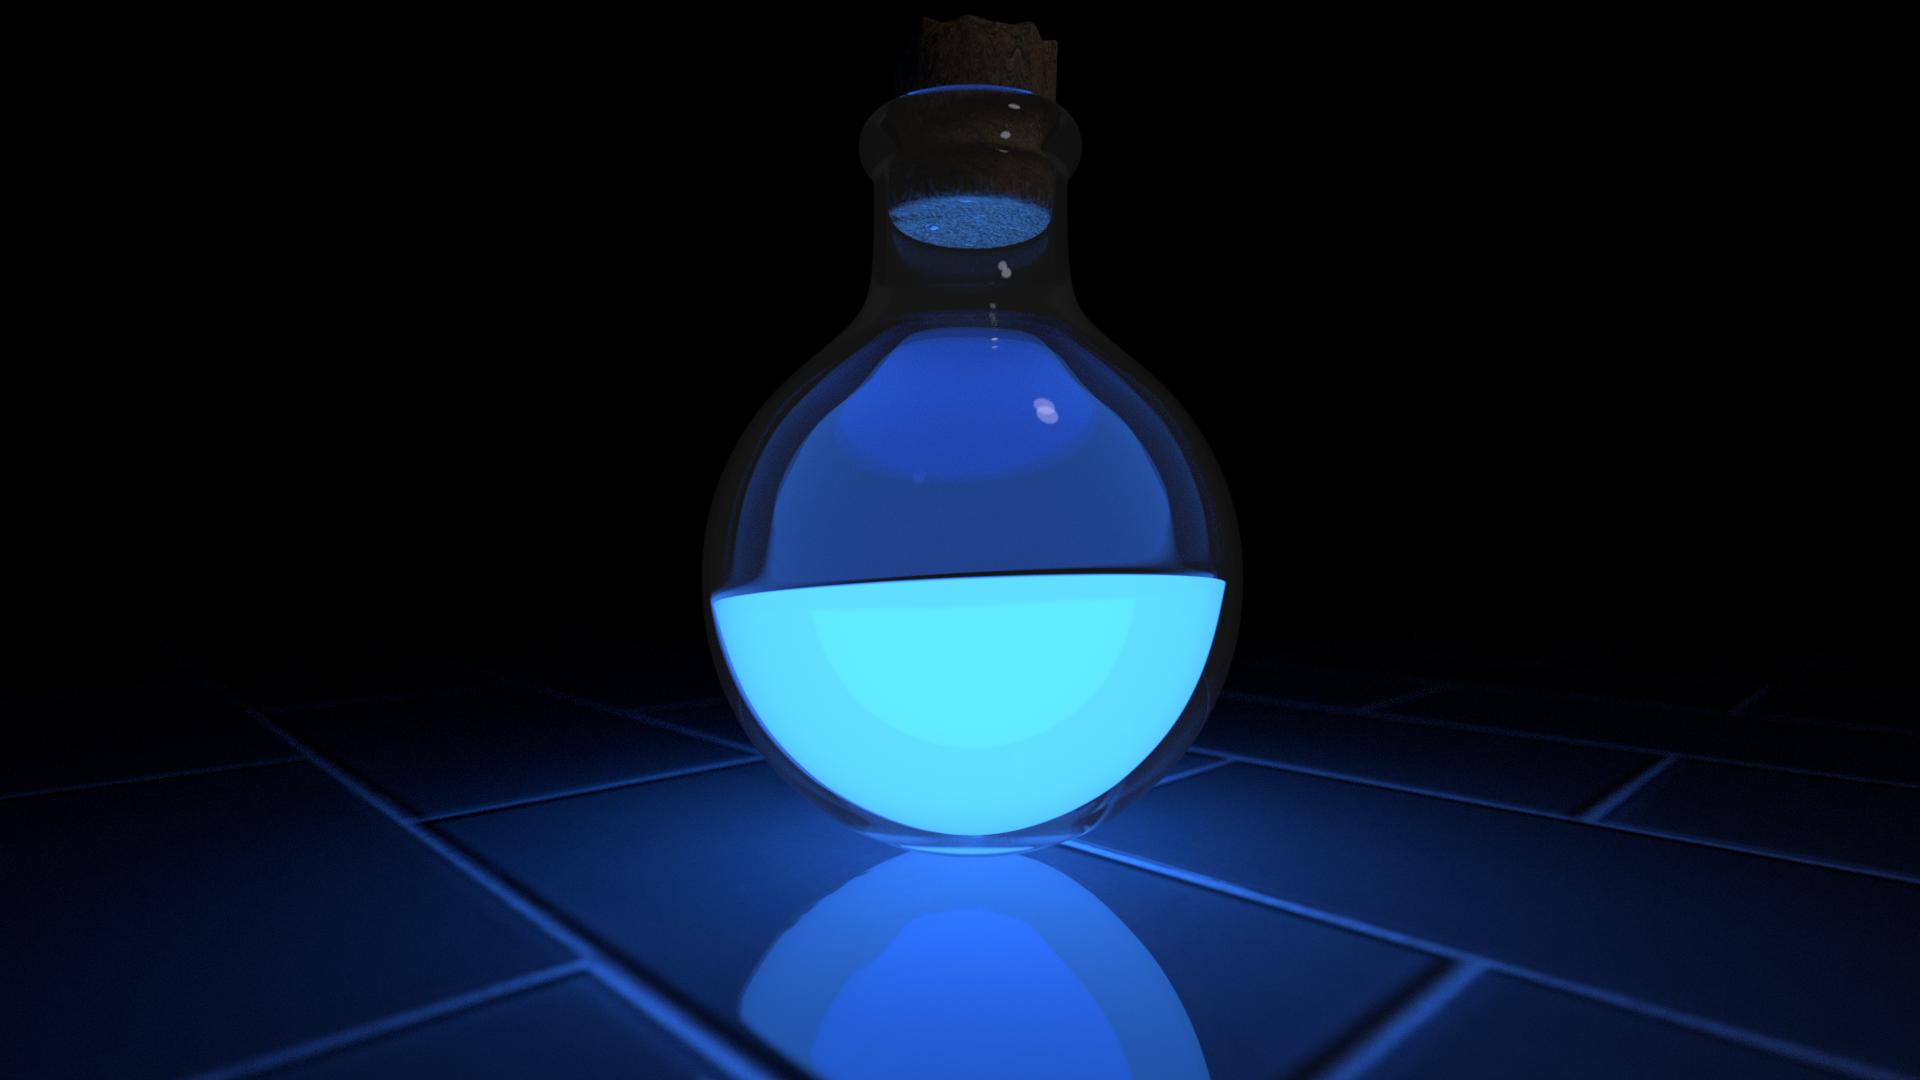 General 1920x1080 dark potions tiles blue light glowing fluid glass digital art blue abstract cyan